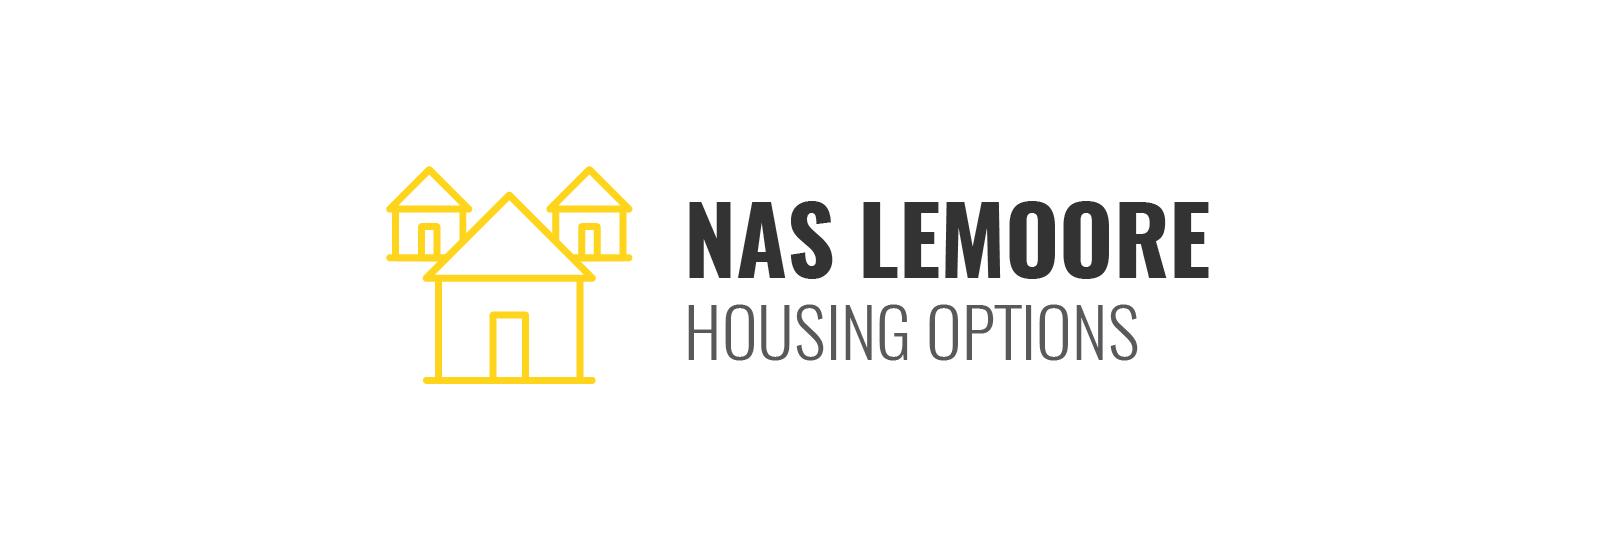 NAS Lemoore Housing Options